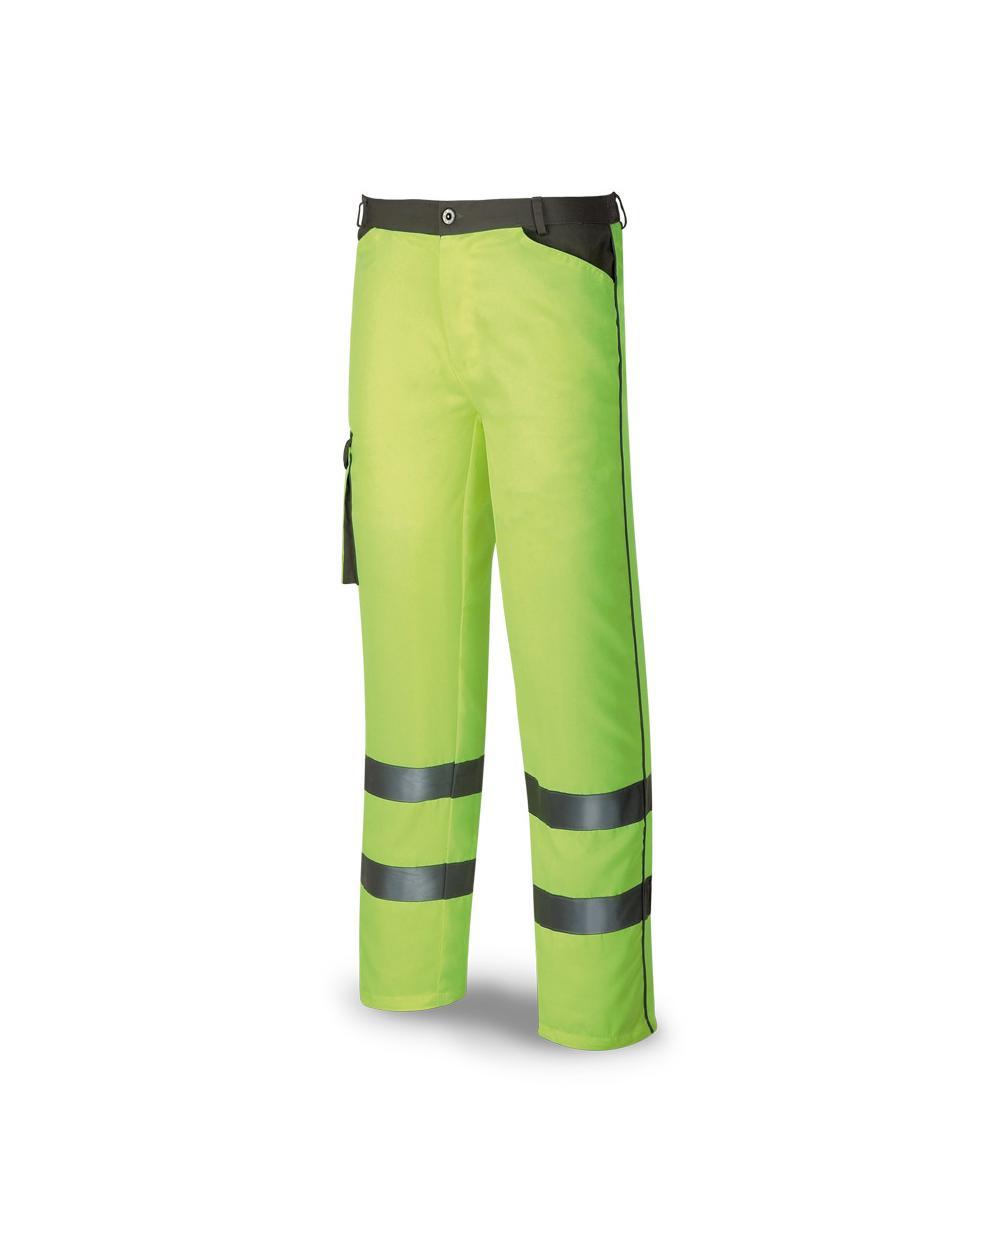 Comprar Pantalón Alta Visibilidad Amarillo 488-Pf Top barato